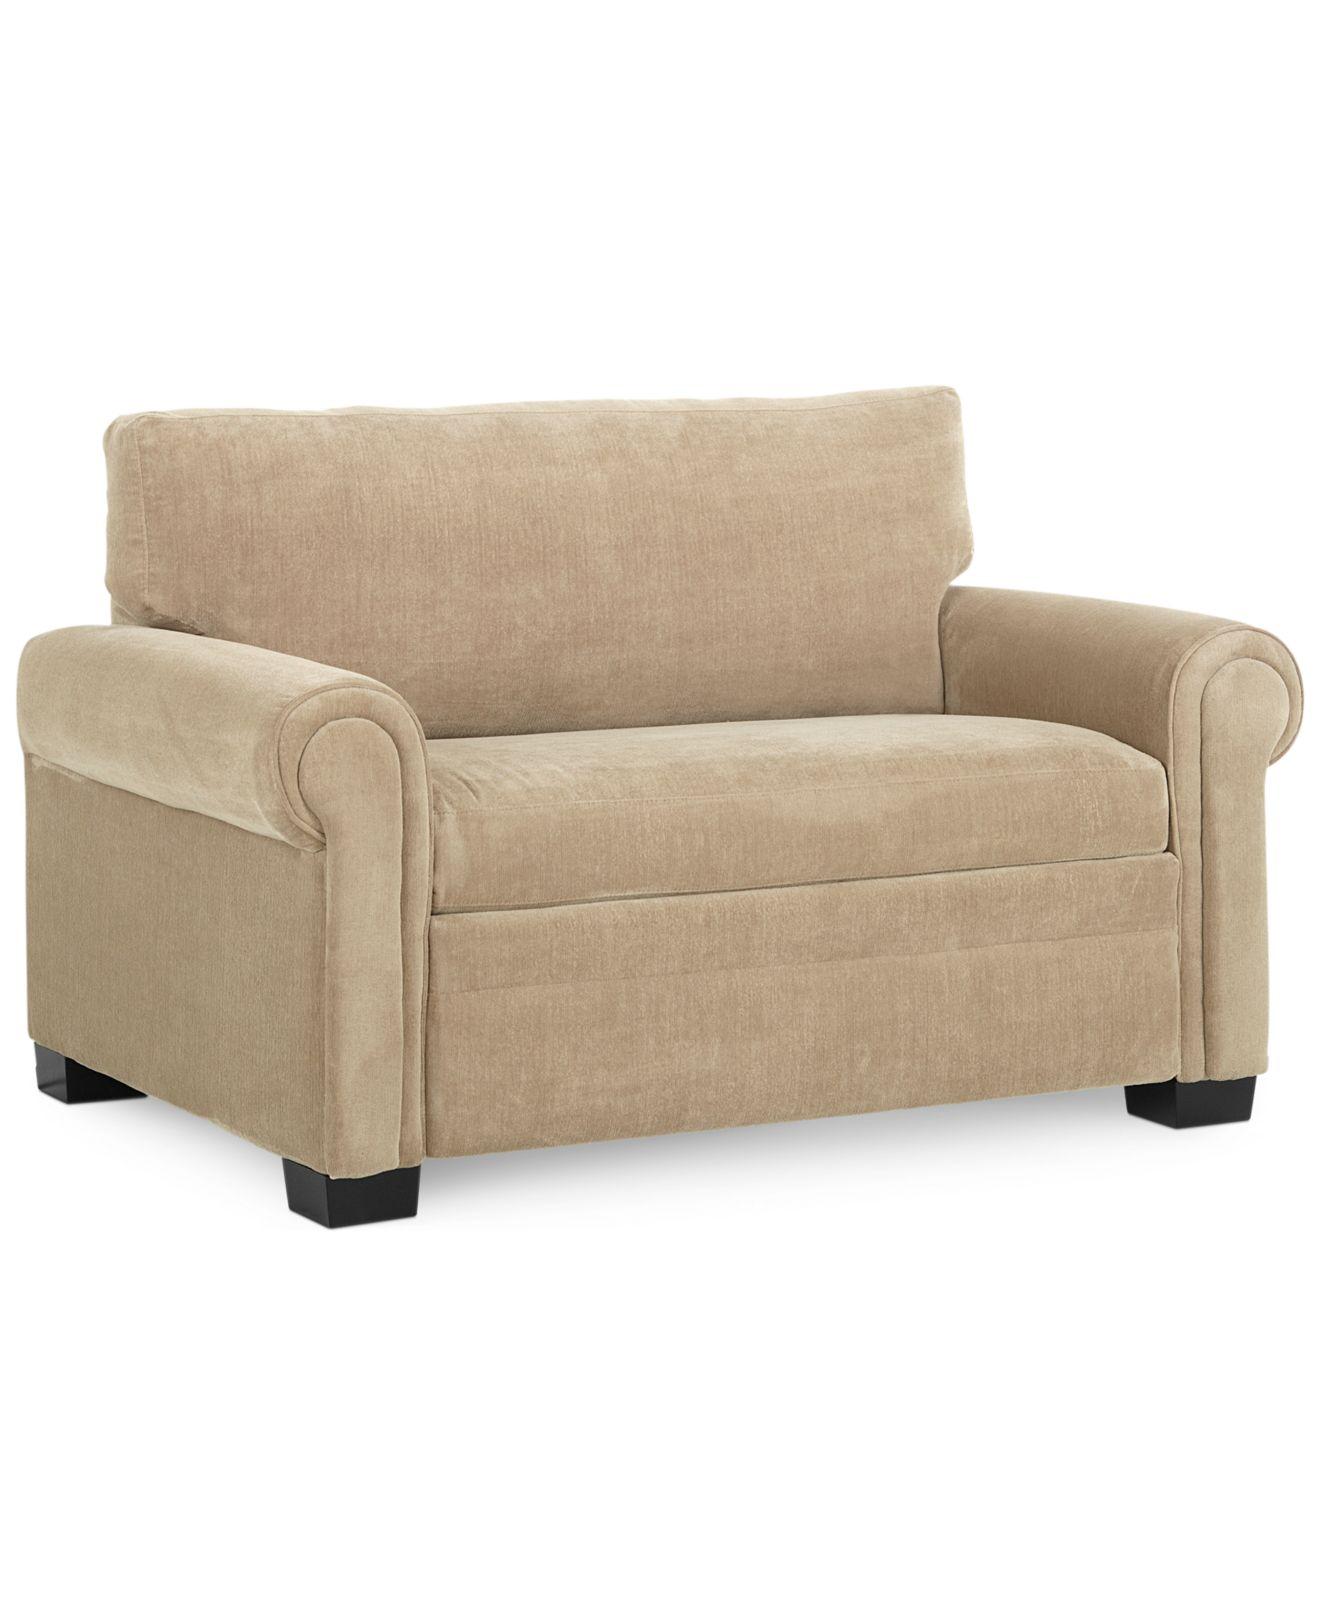 sofas at macys